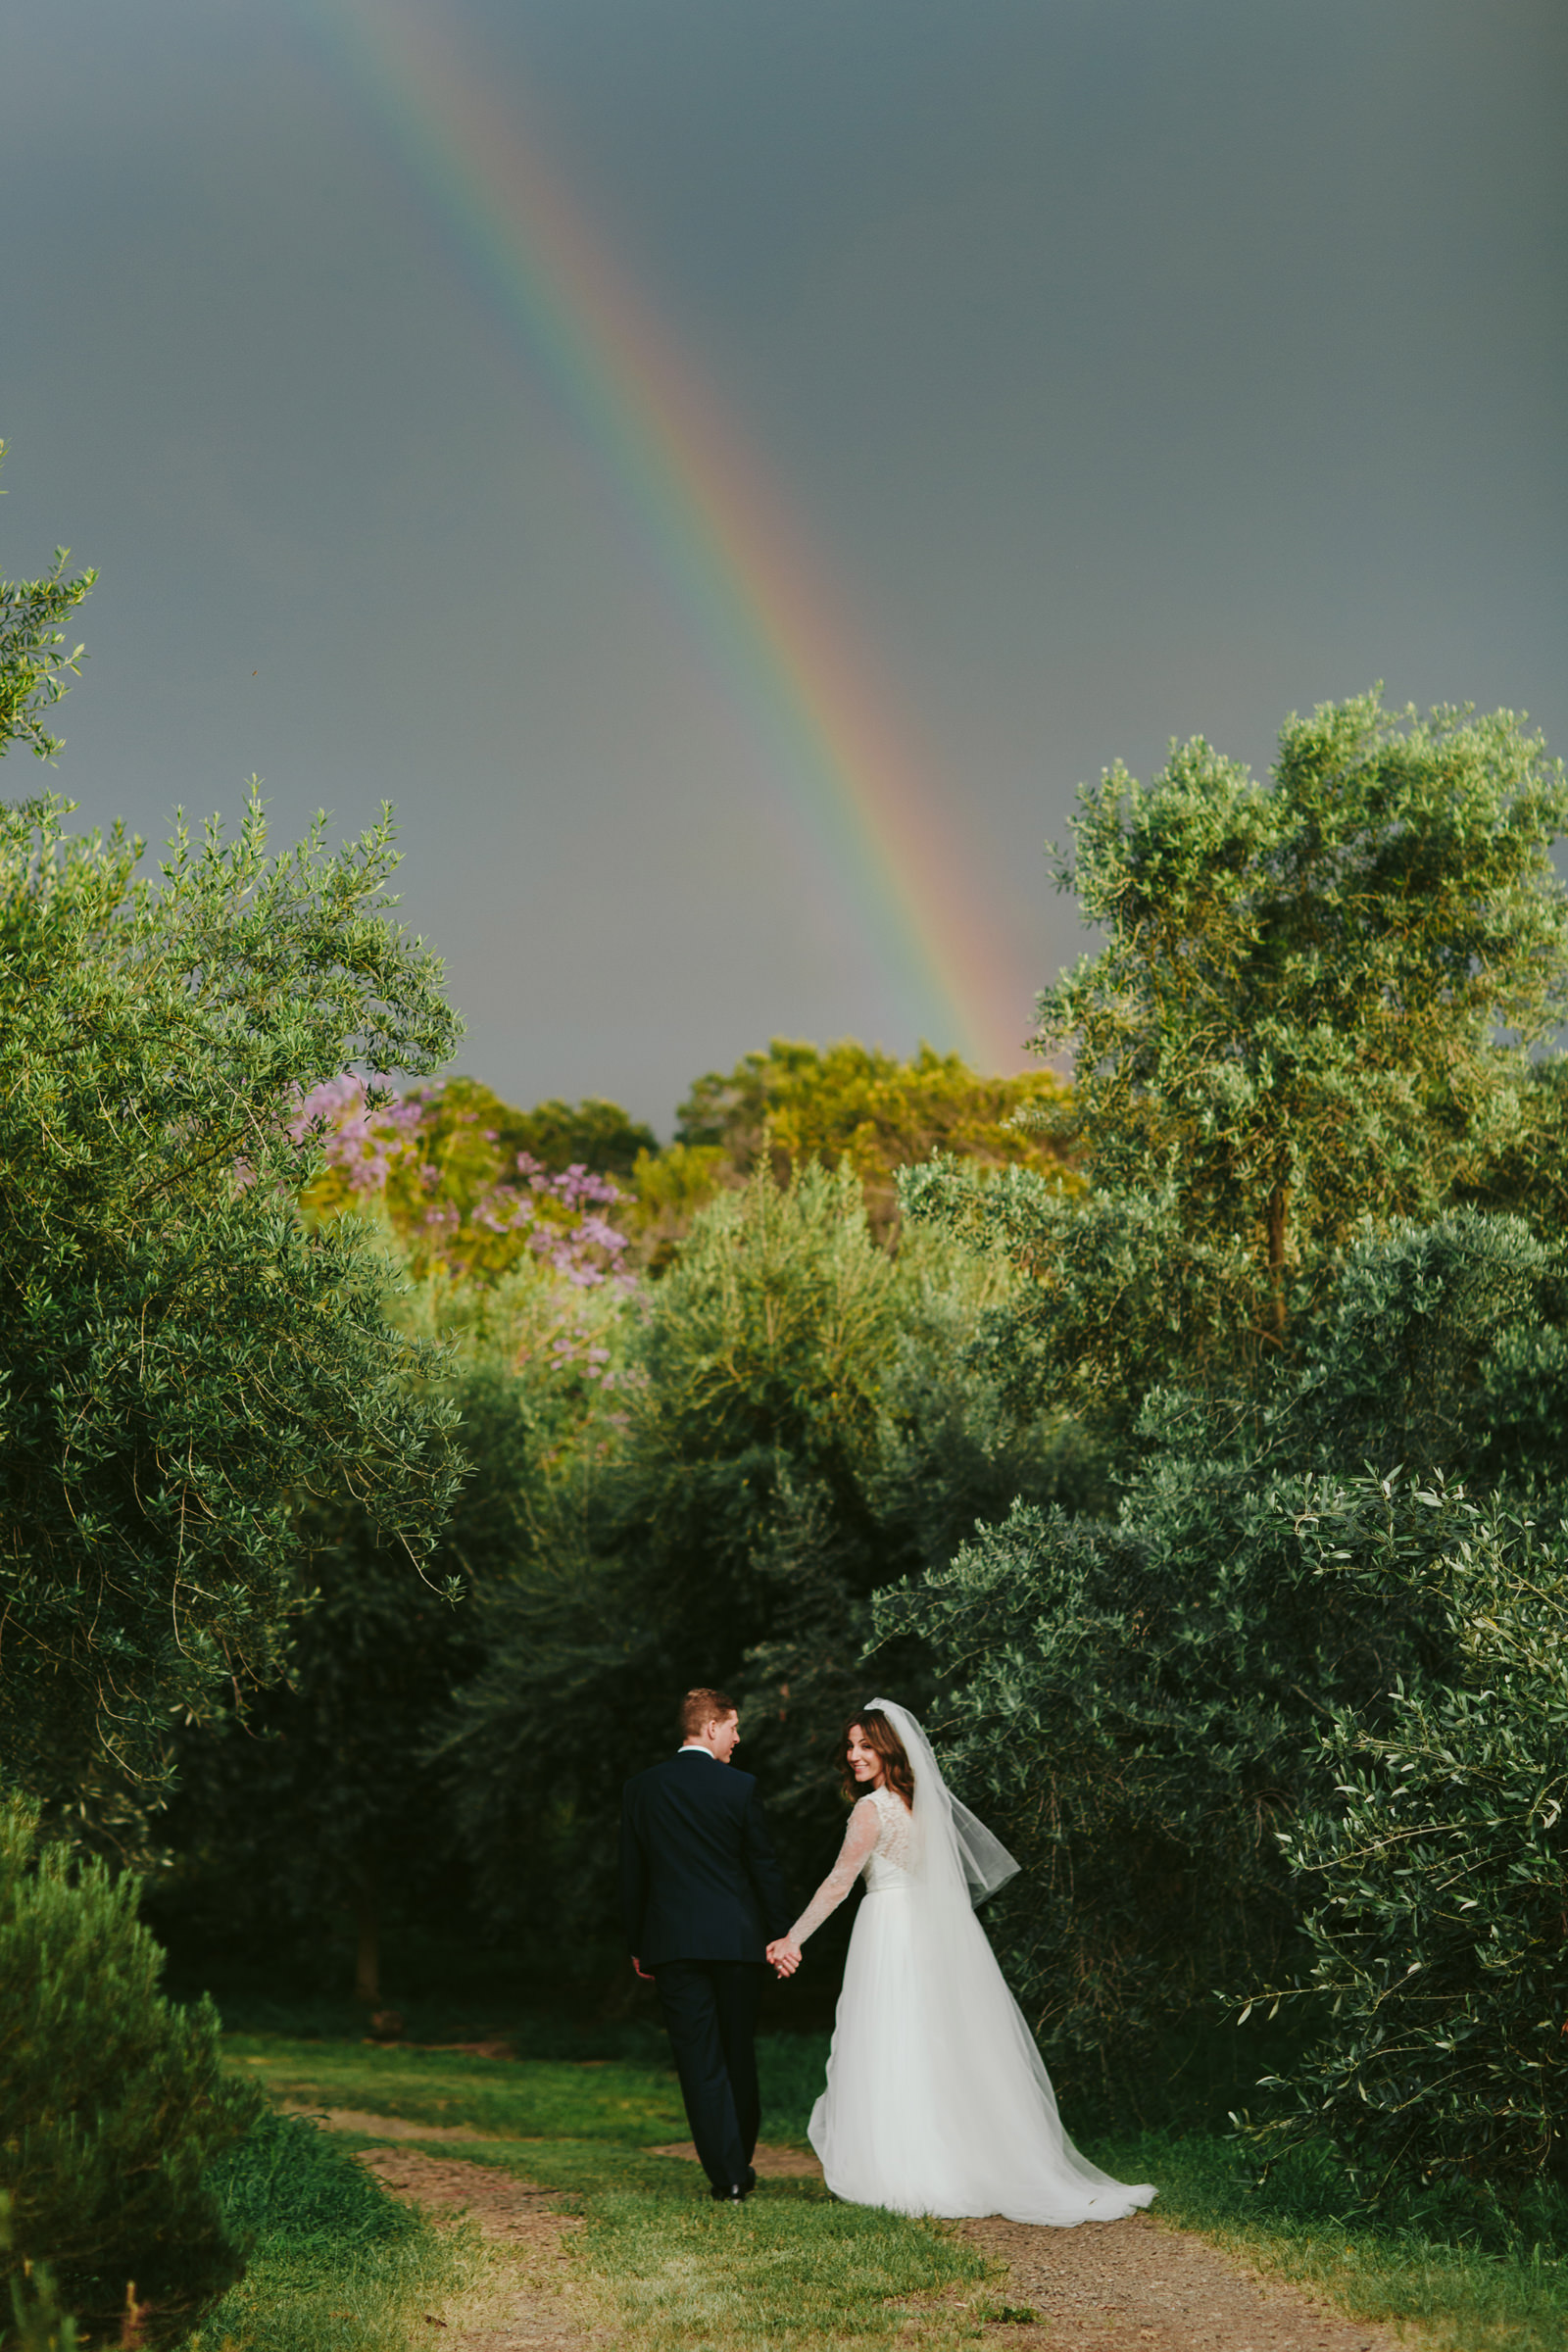 Calasa olive farm maui couple walks down path under rainbow - photo by Melia Lucida